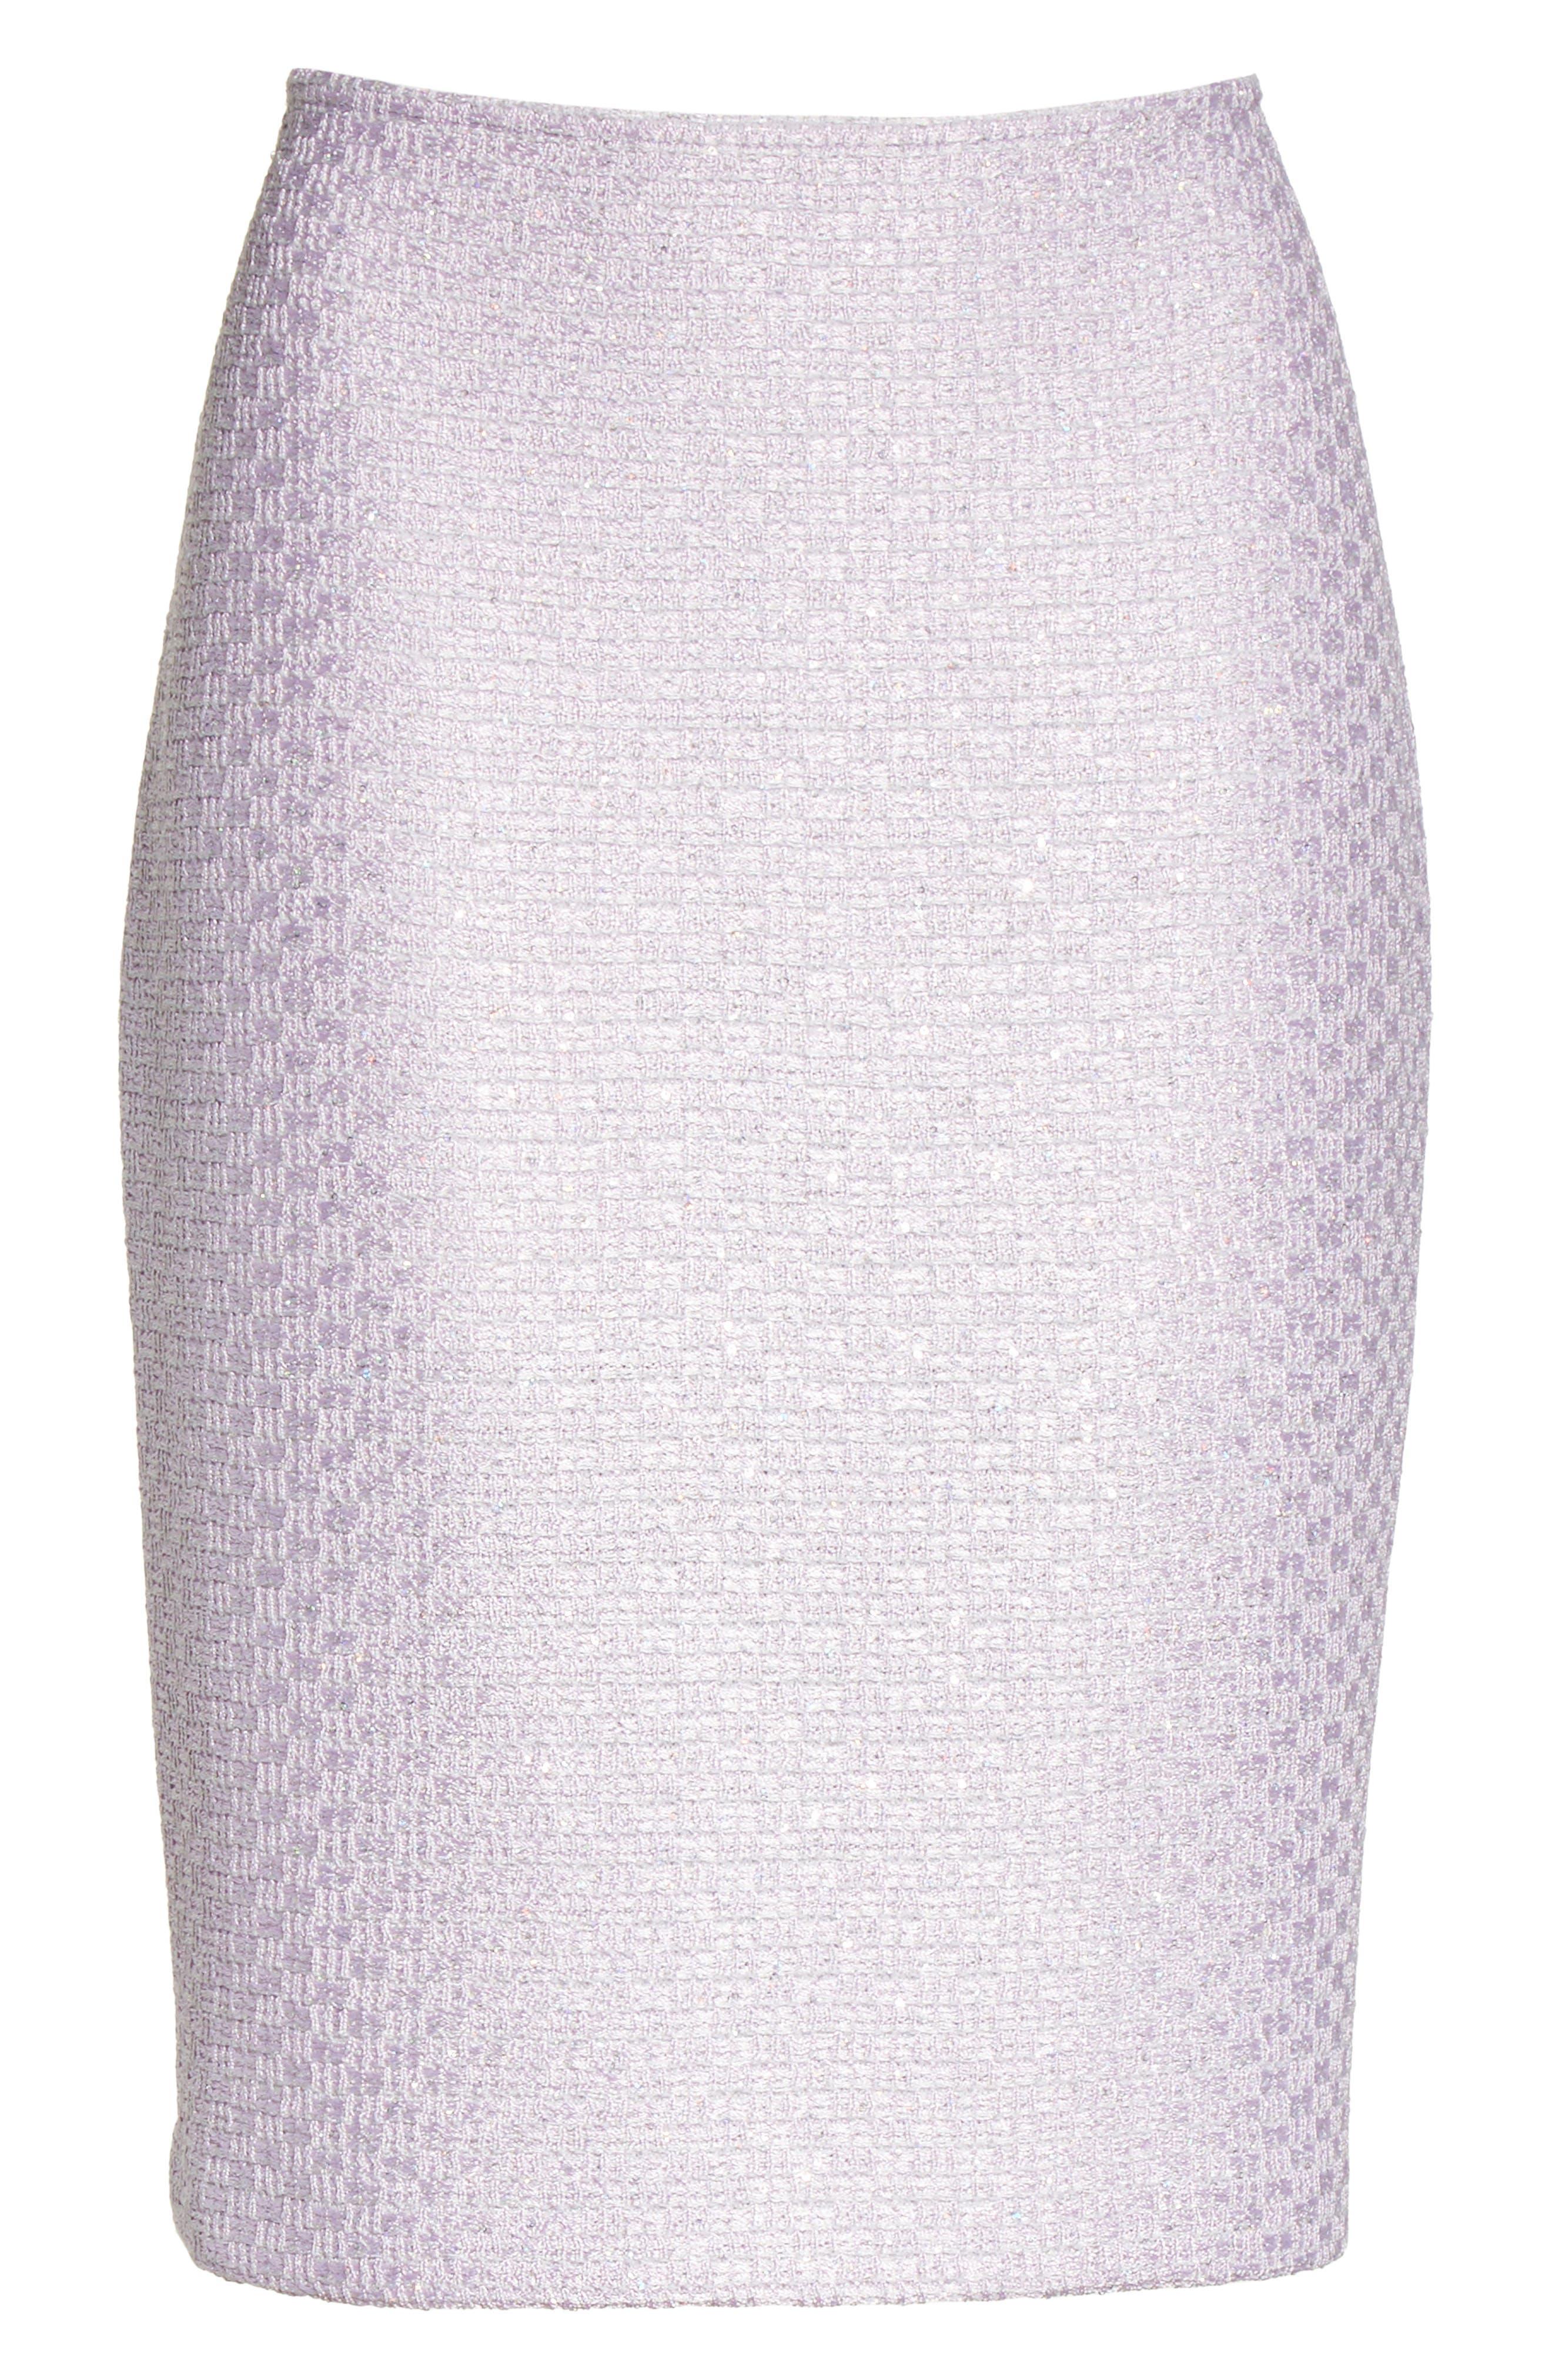 Hansh Sequin Knit Pencil Skirt,                             Alternate thumbnail 7, color,                             Lilac Multi